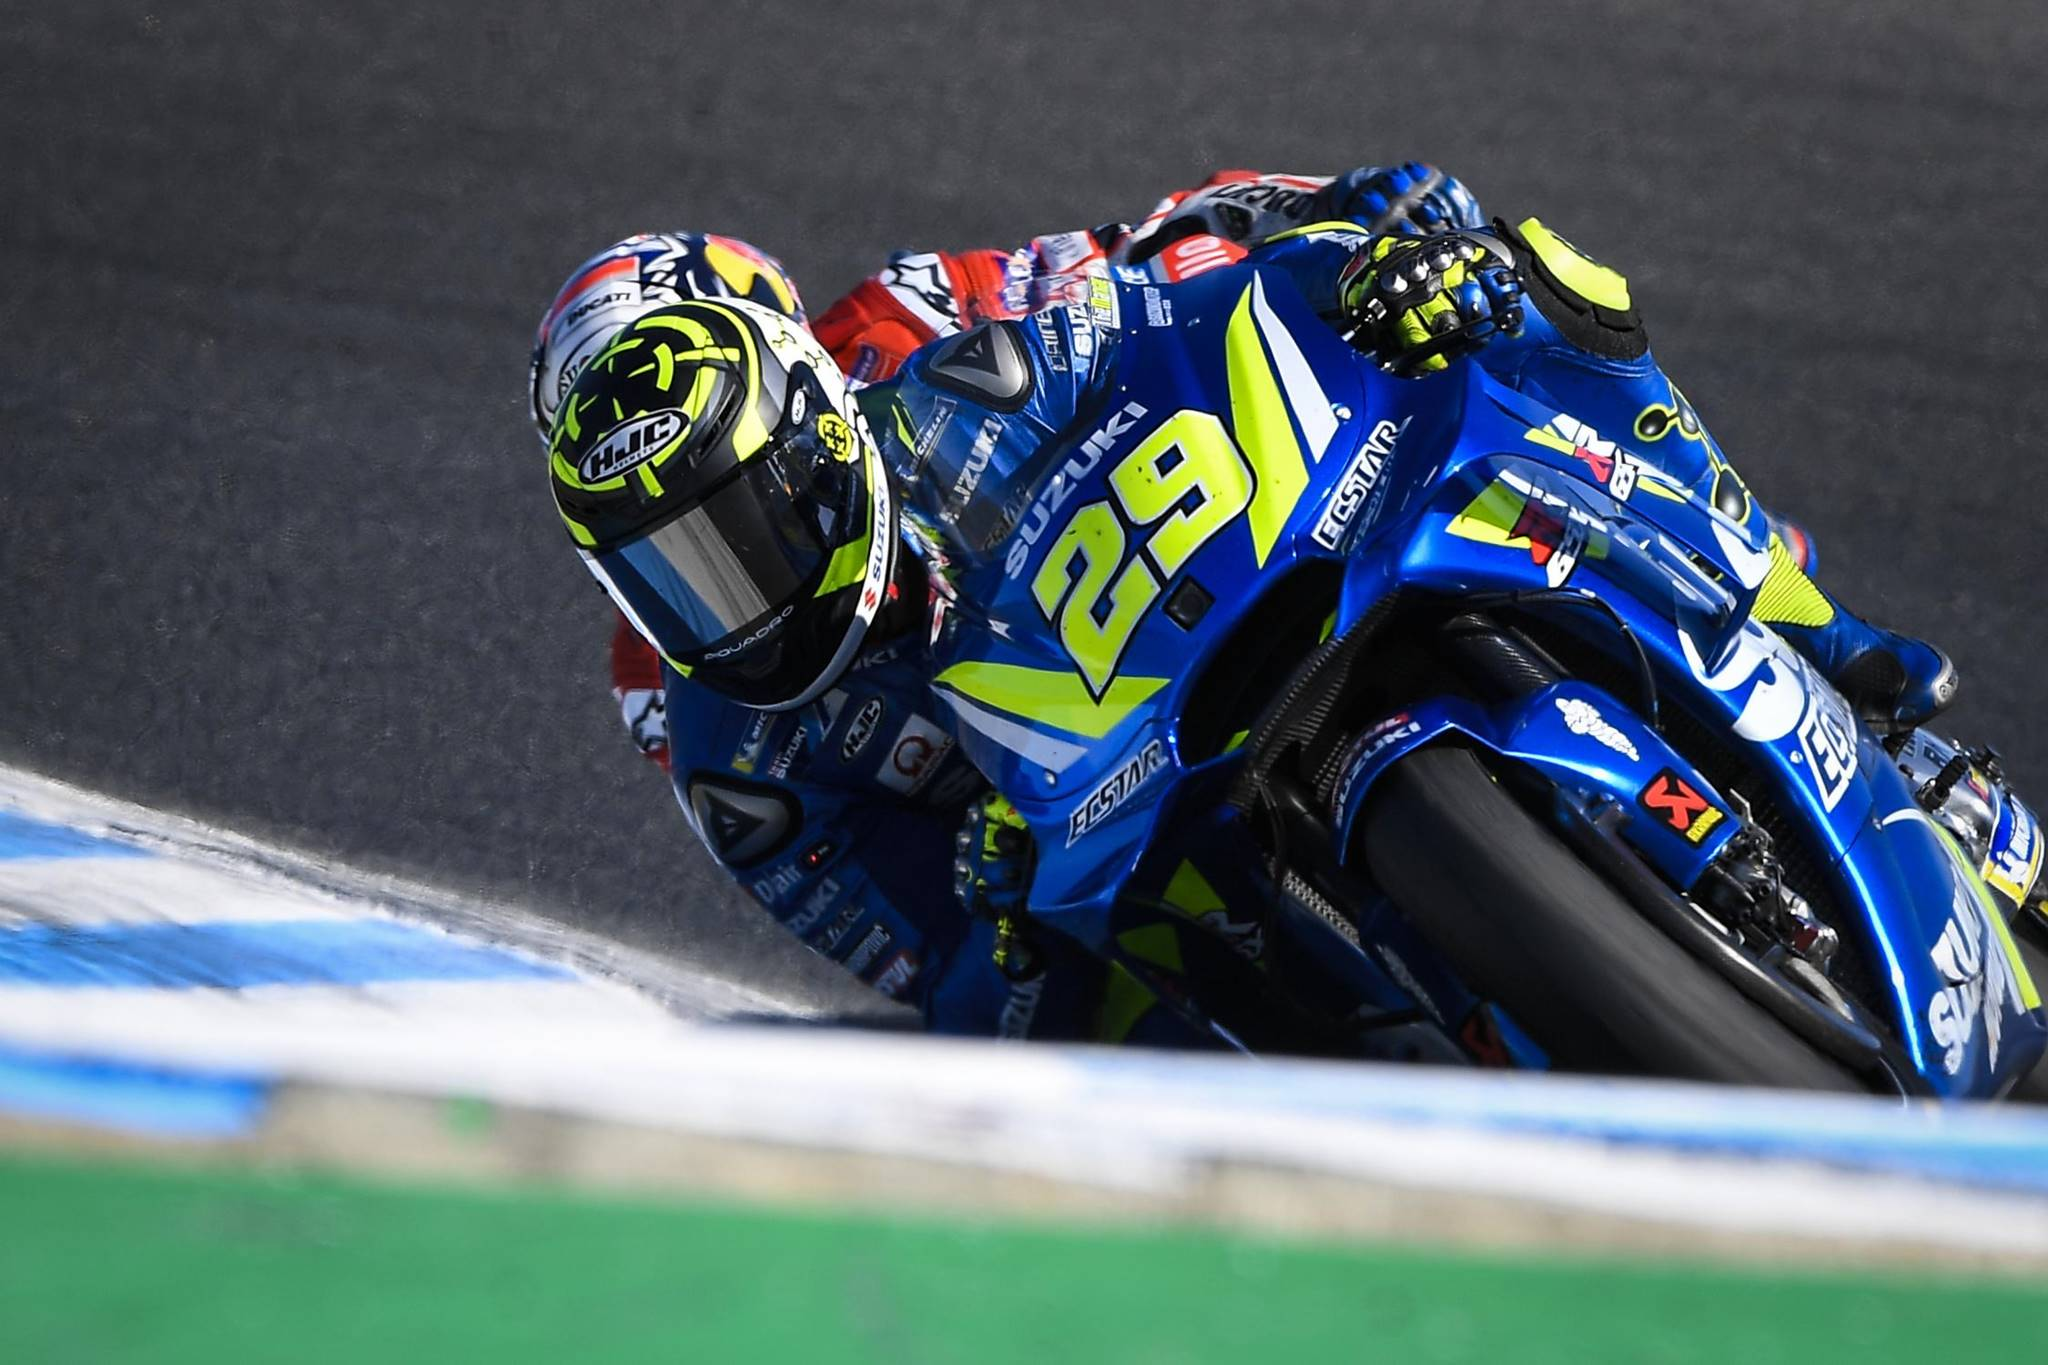 MotoGP_2018_AustralianGP_Xe_Tinhte_007.jpg